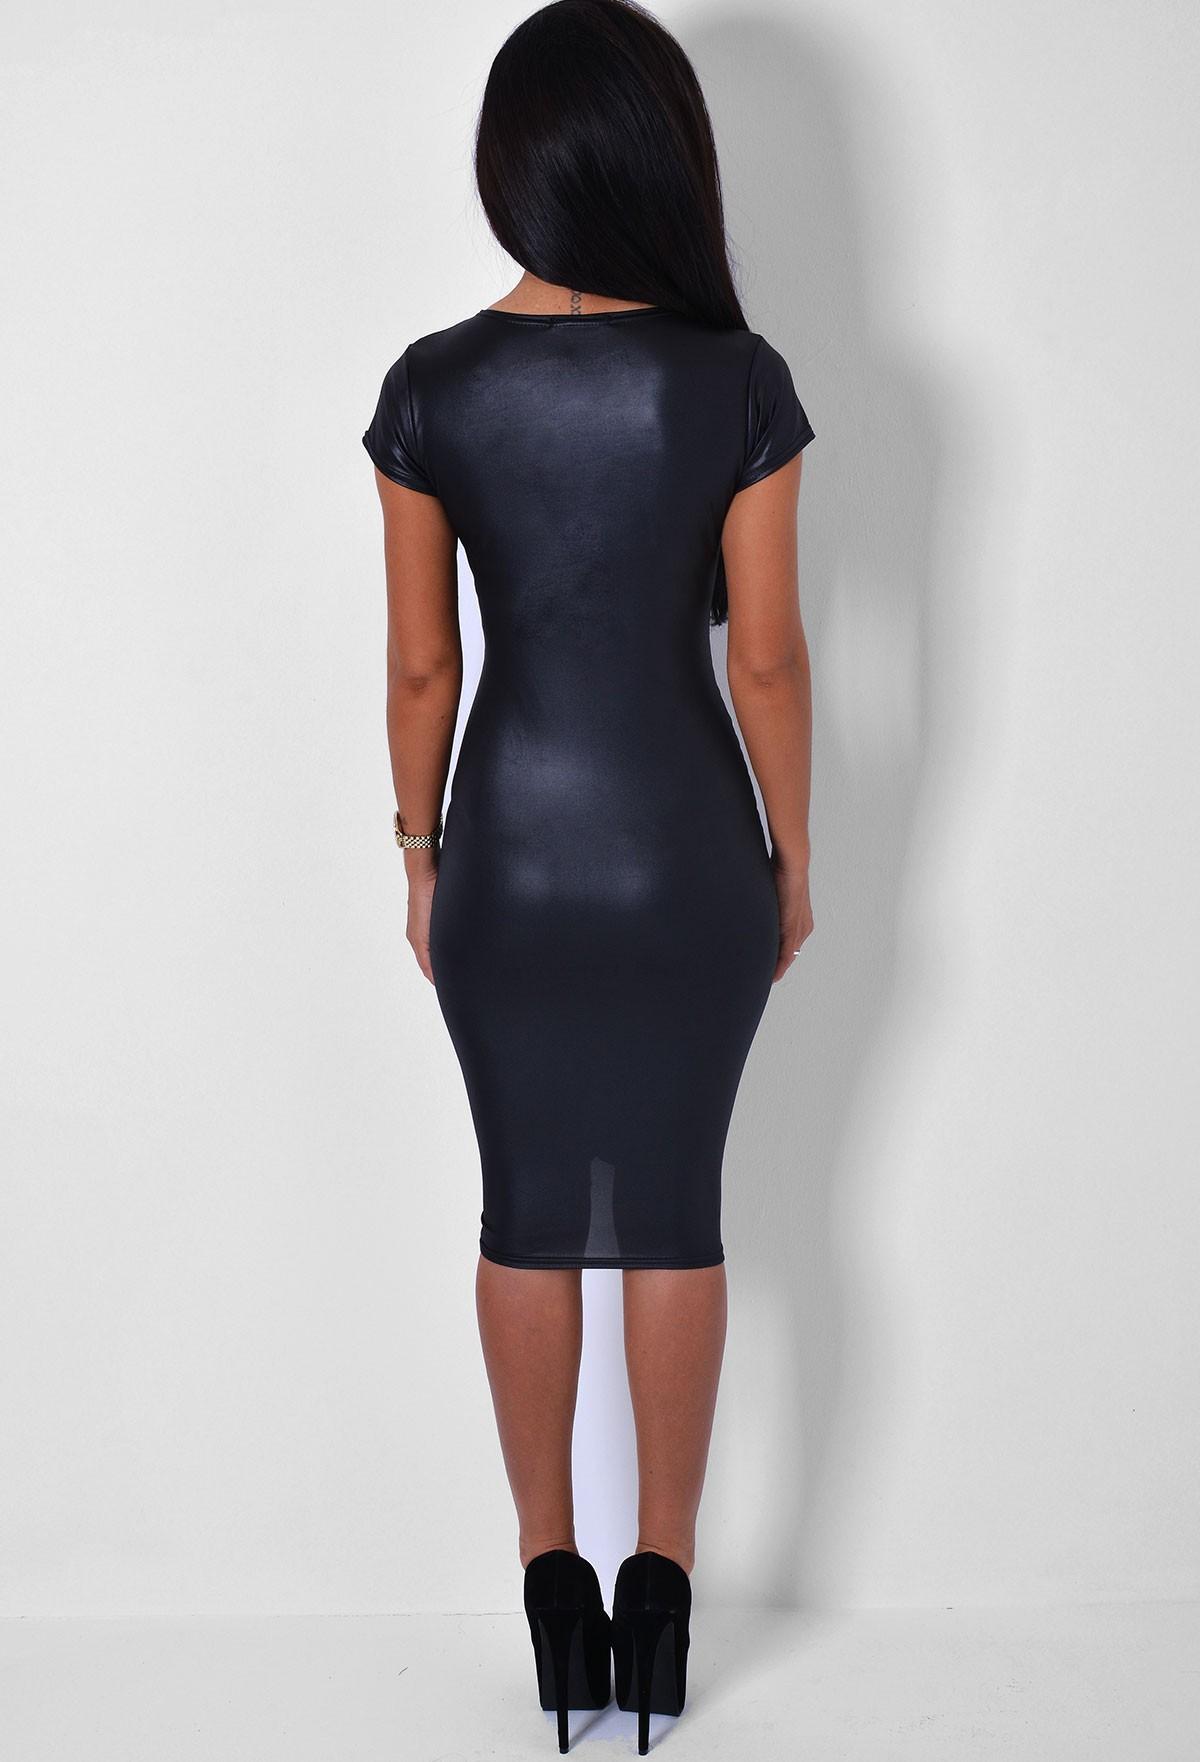 Sycamore wet look cap sleeve midi dress